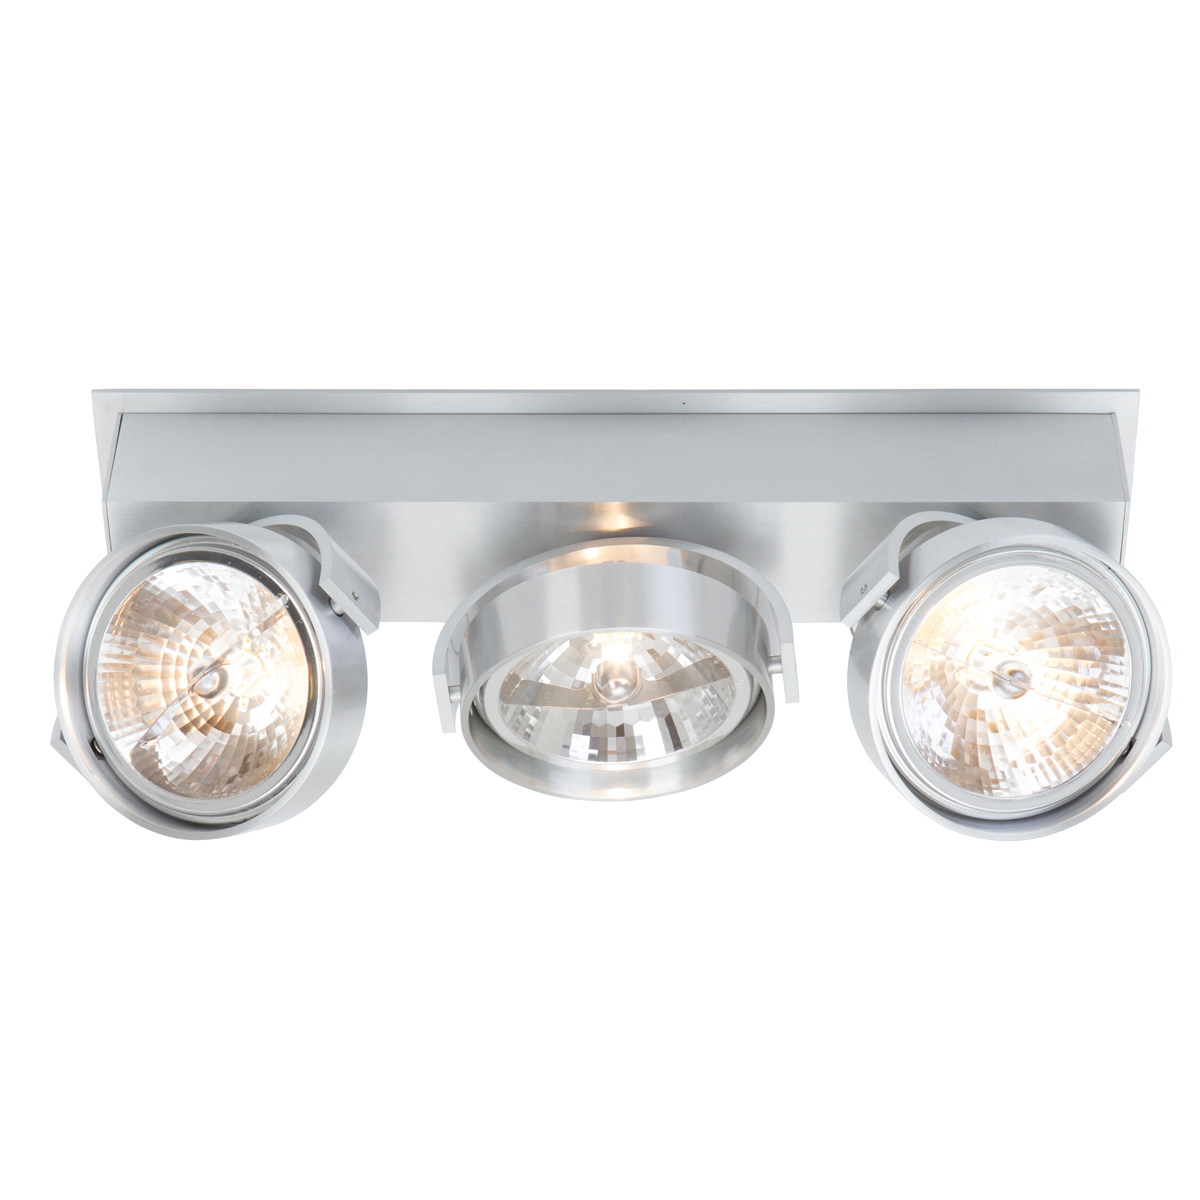 Stoere industri le spot 3 lichtpunten industri le lampen for Industriele spots